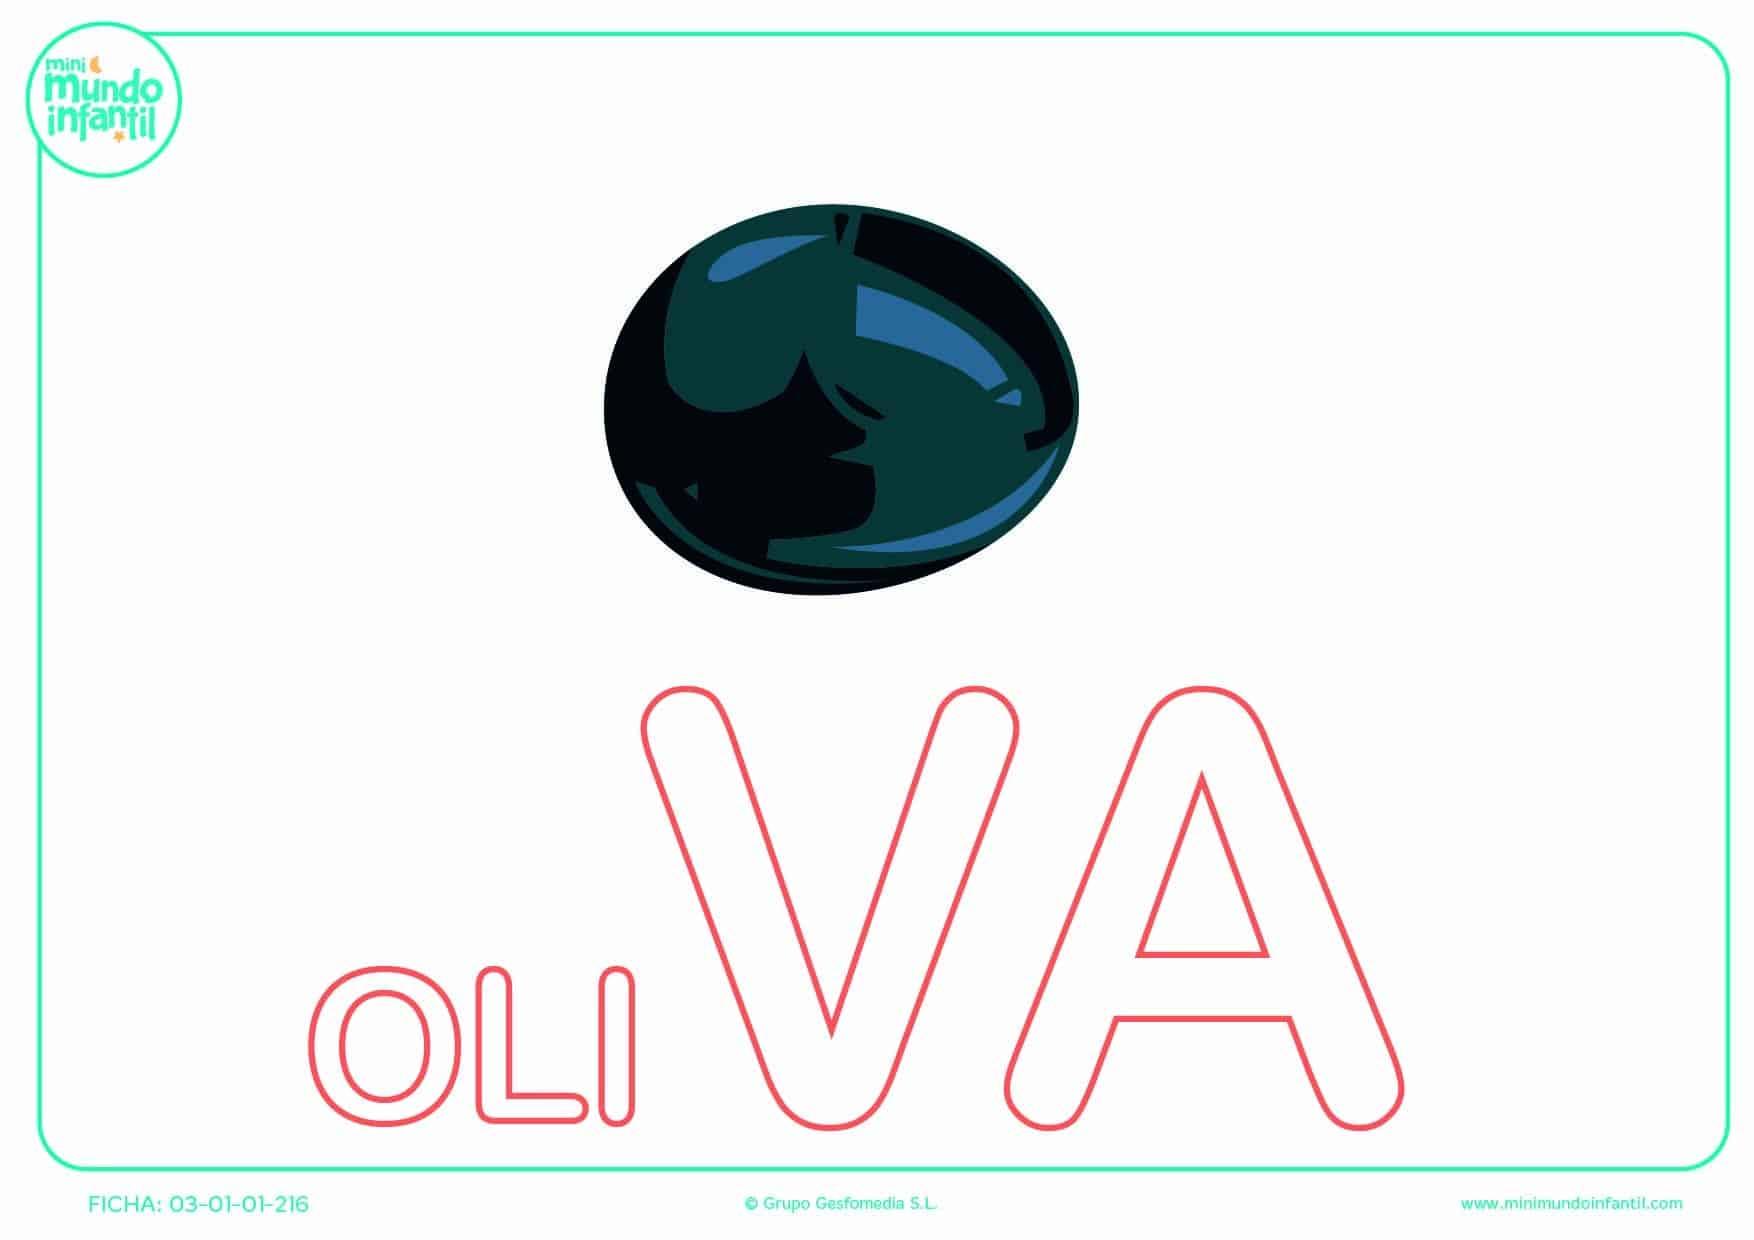 Completar la sílaba VA mayúscula de oliva